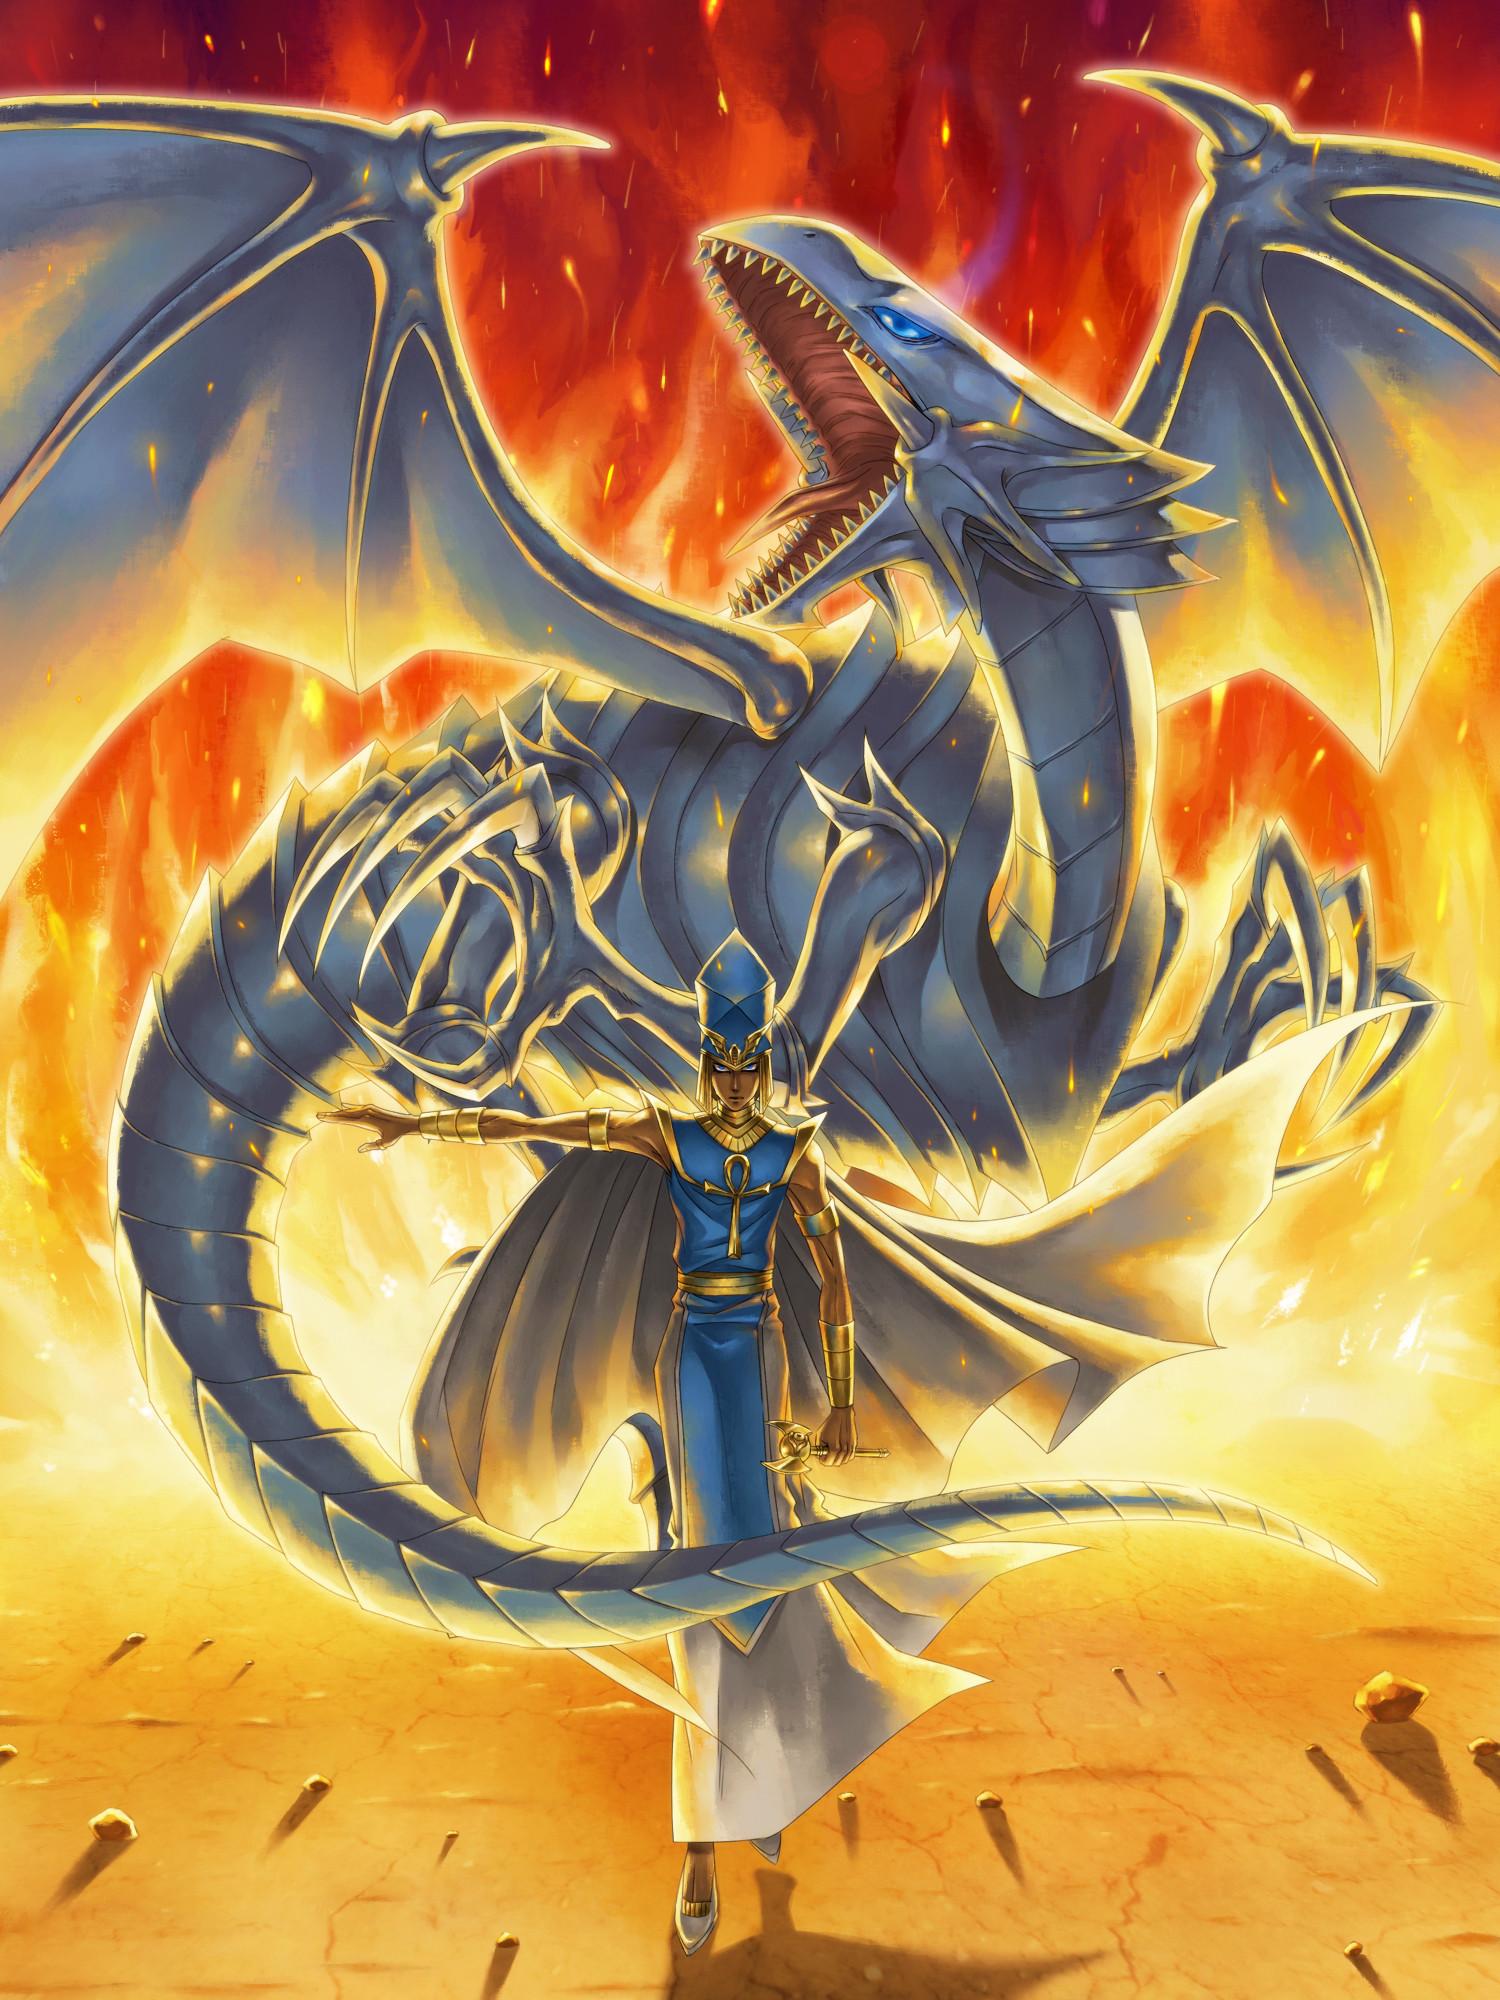 High priest Seto and his Blue-Eyes White Dragon.